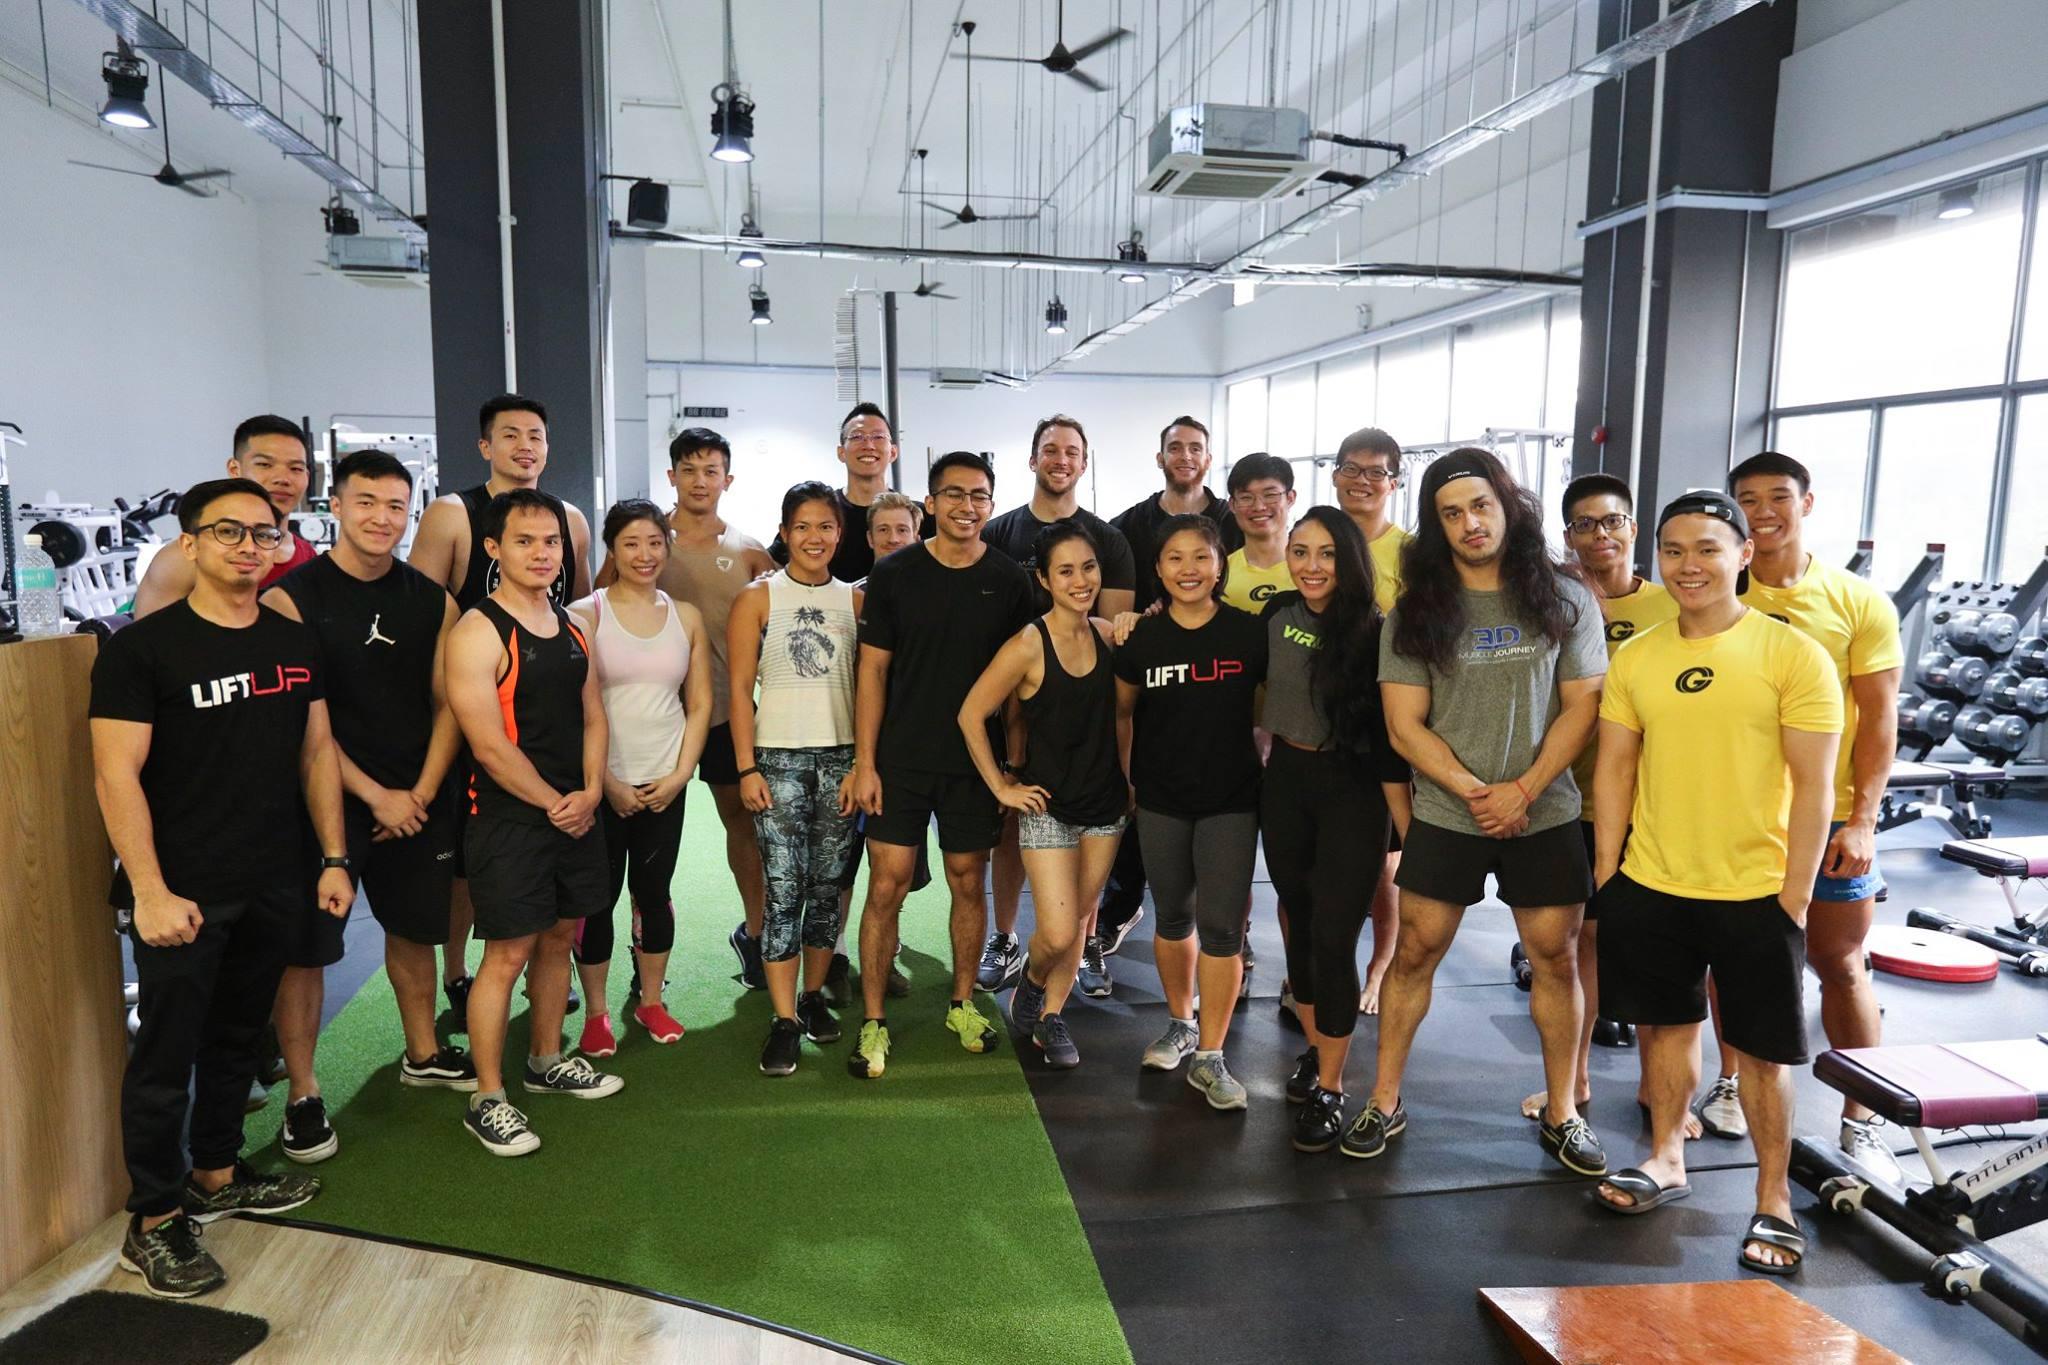 WNBF Singapore Melvyn Yeo Eric Helms Alberto Nunez Leanna Carr 3DMJ